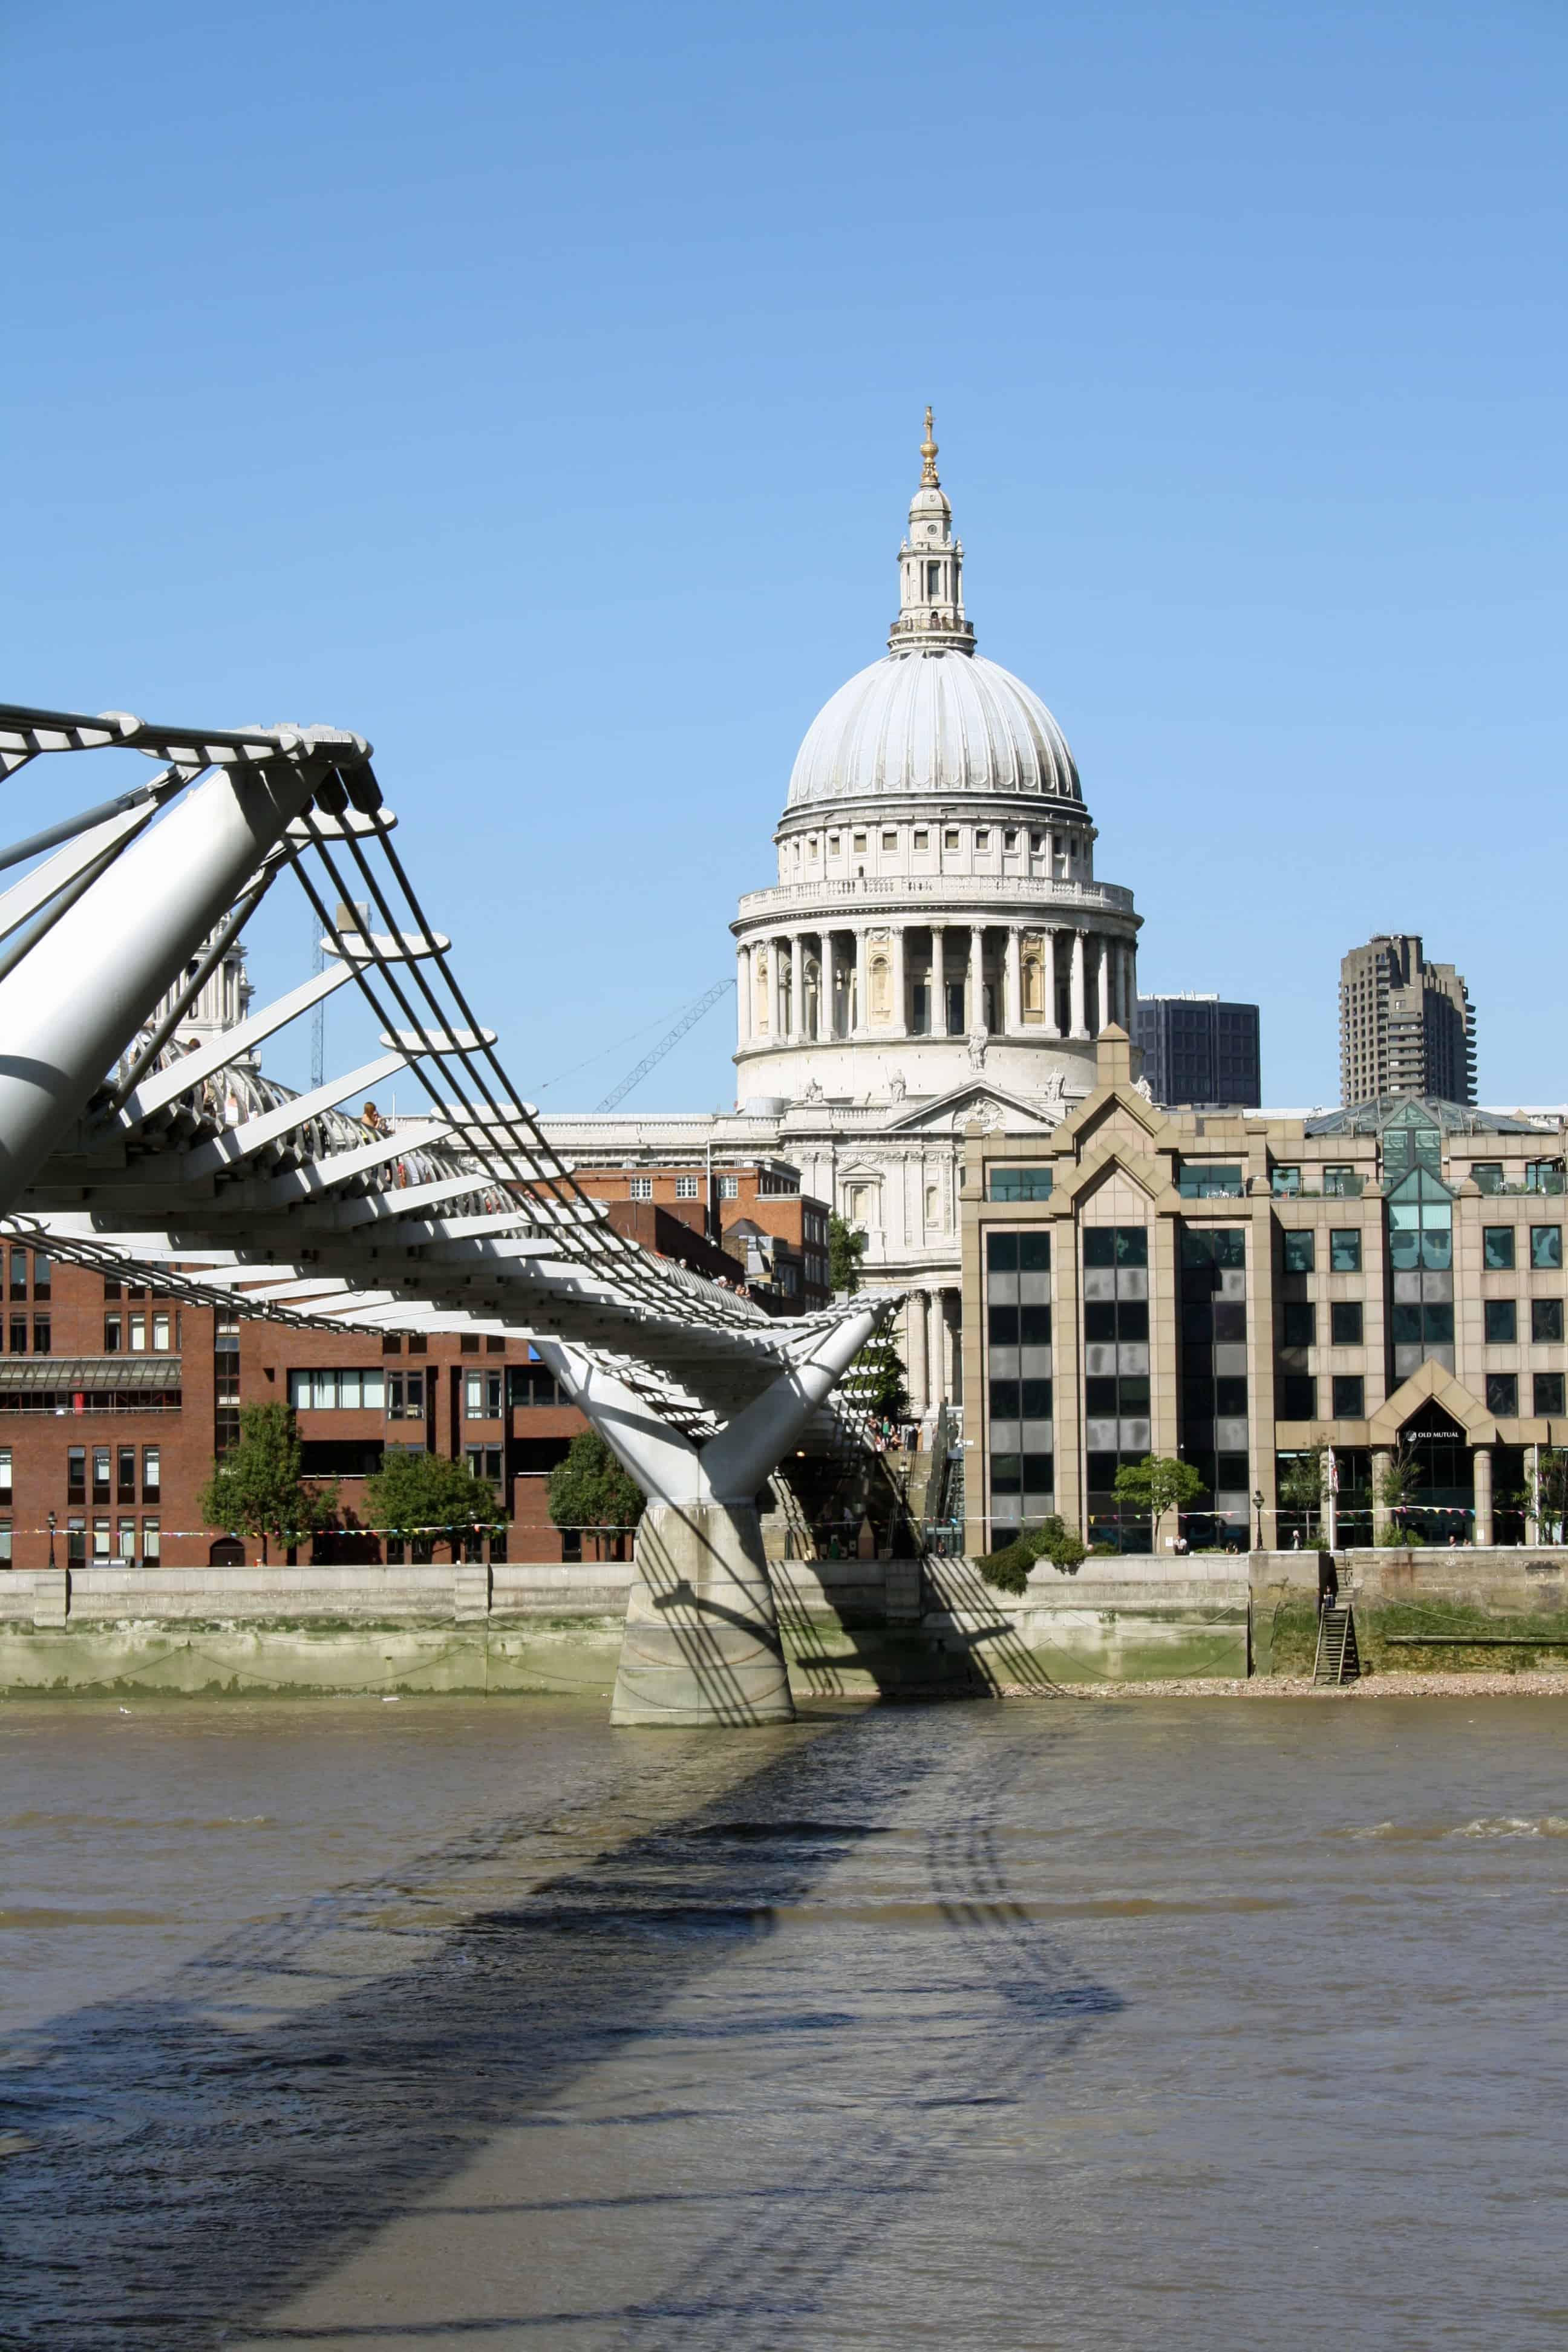 St Pauls Bridge